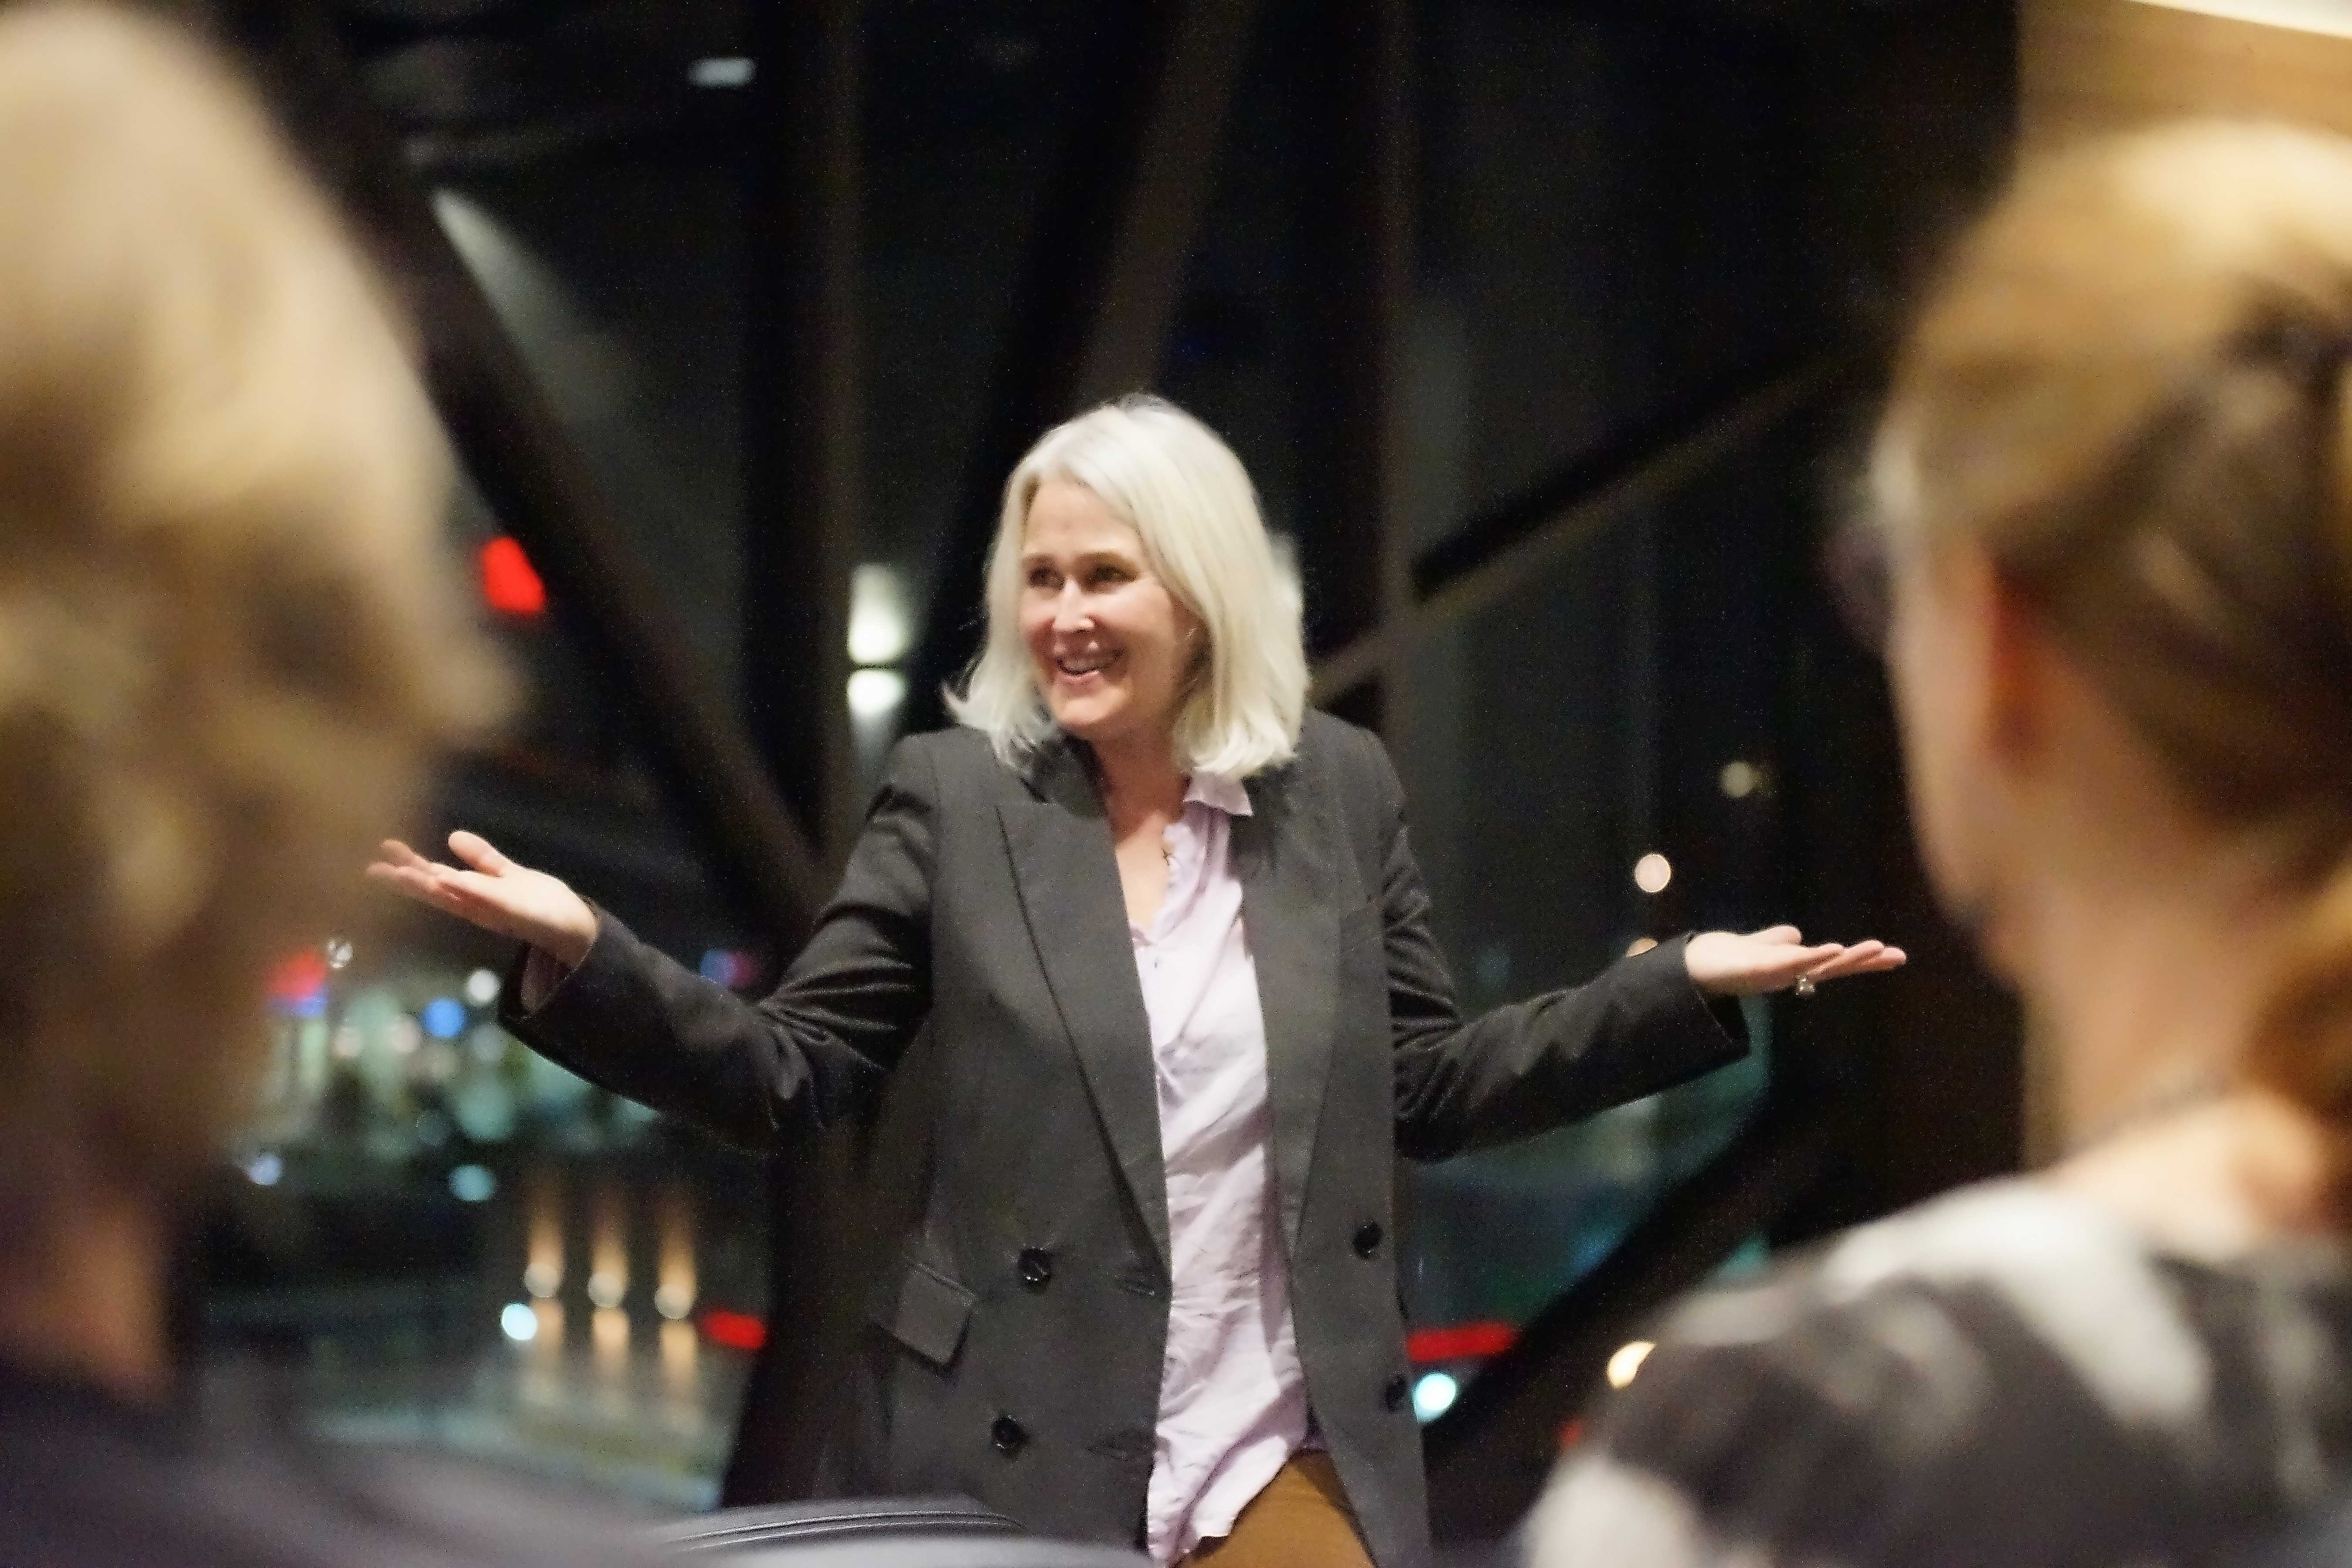 Filmmaker Dana Weidman presents her film at Lindenwood University on Thursday, Nov. 2.  Photo by Mitchell Kraus